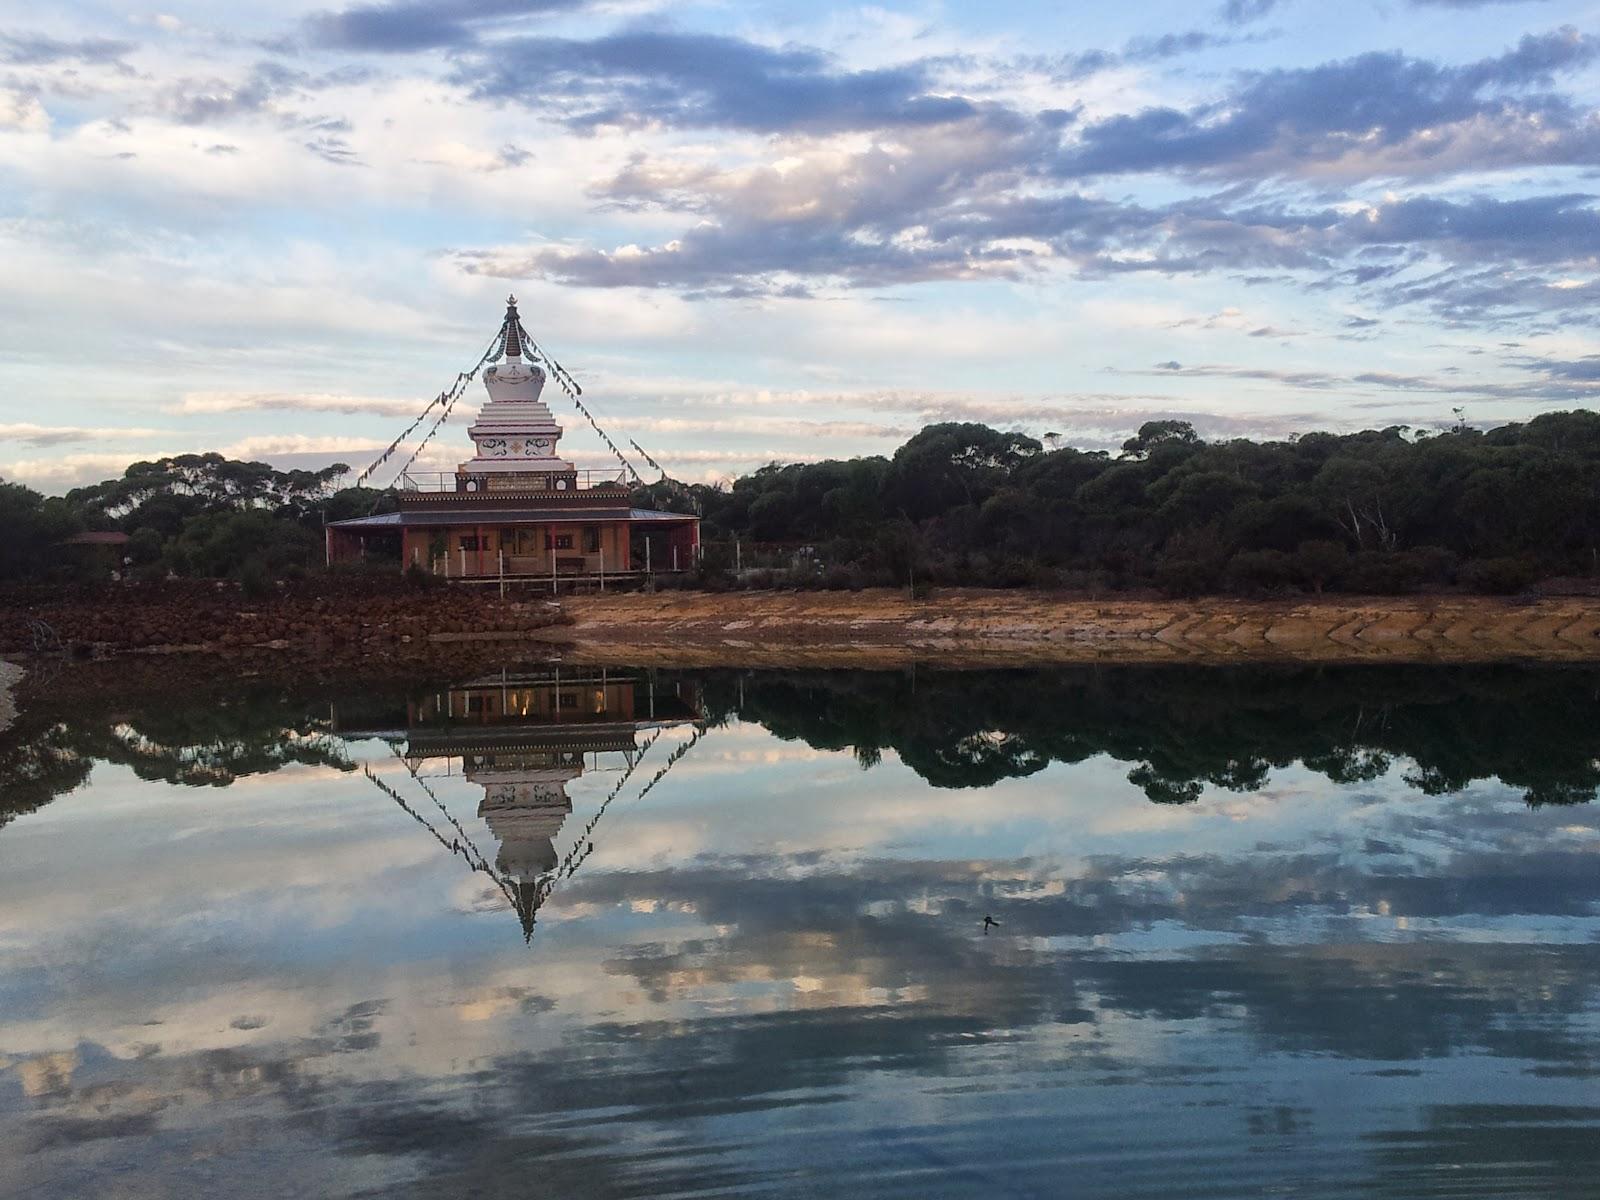 Enlightenment Stupa (9 meters, 29.5 feet) at De Tong Ling Retreat Centre, Kangaroo Island, Australia.